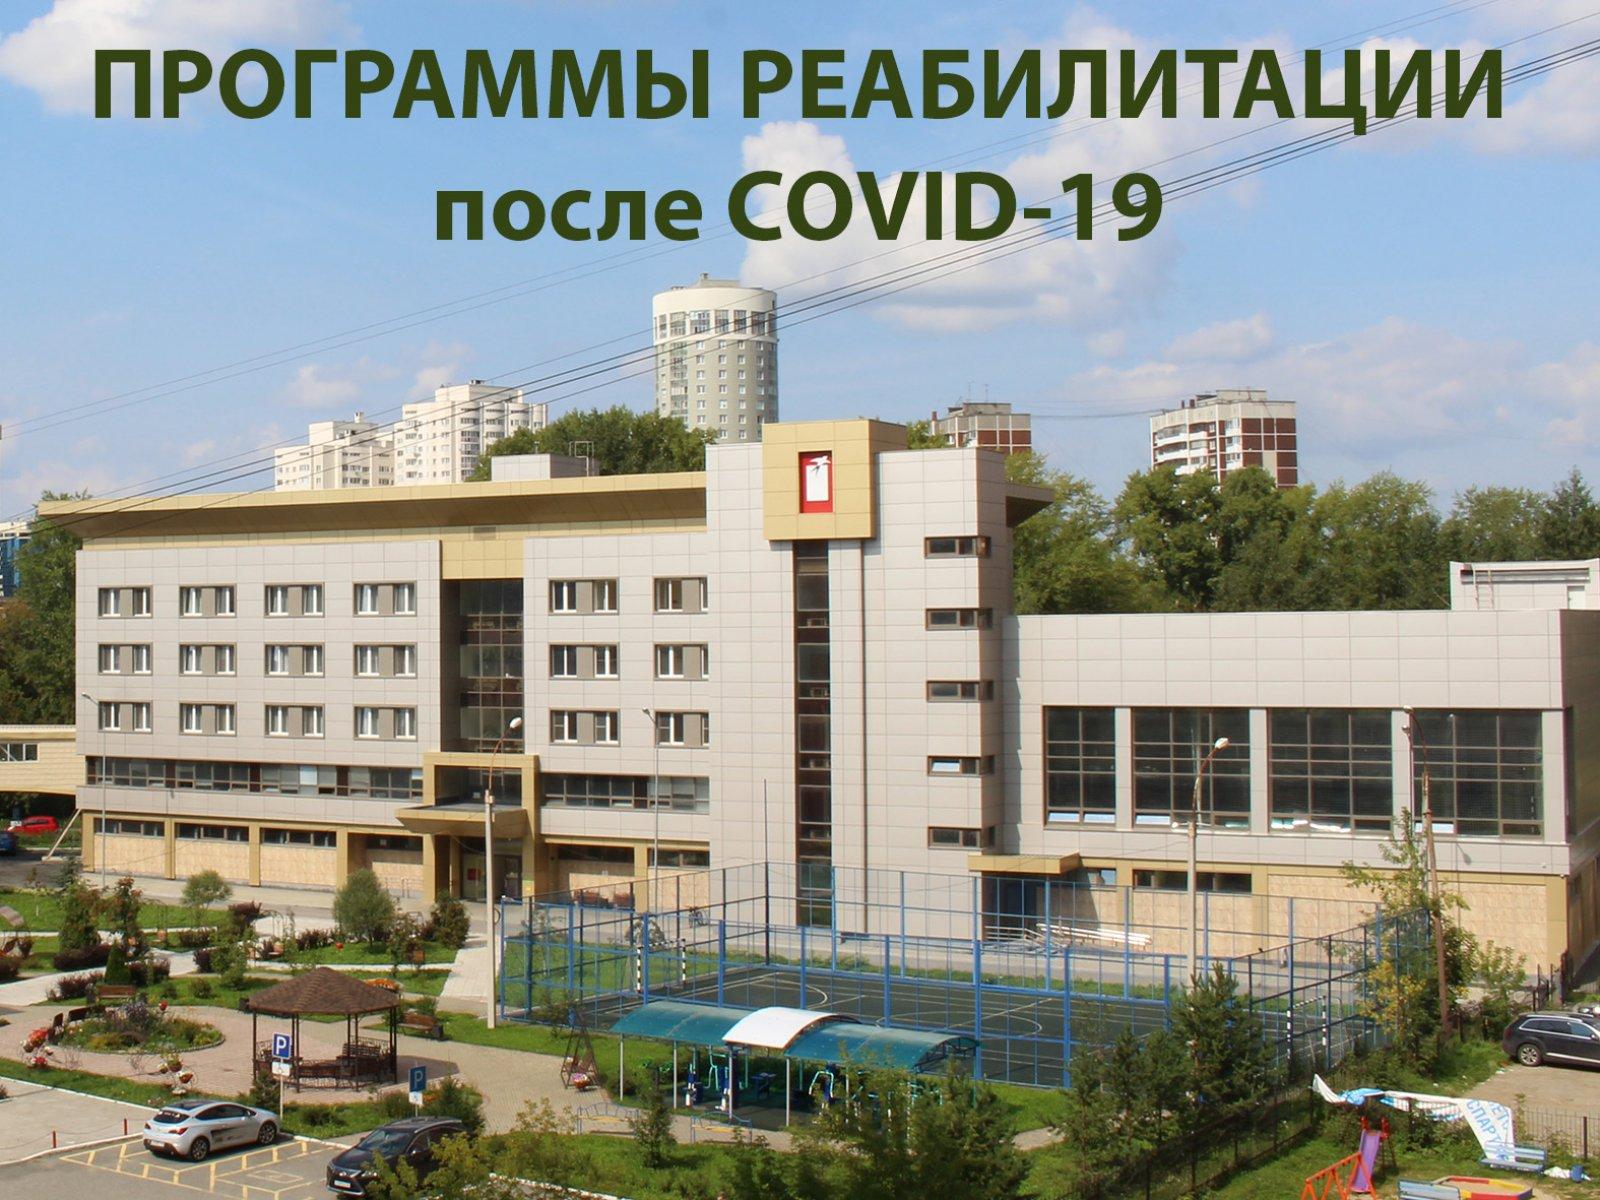 Реабилитация после COVID-19 в Областном центре реабилитации инвалидов